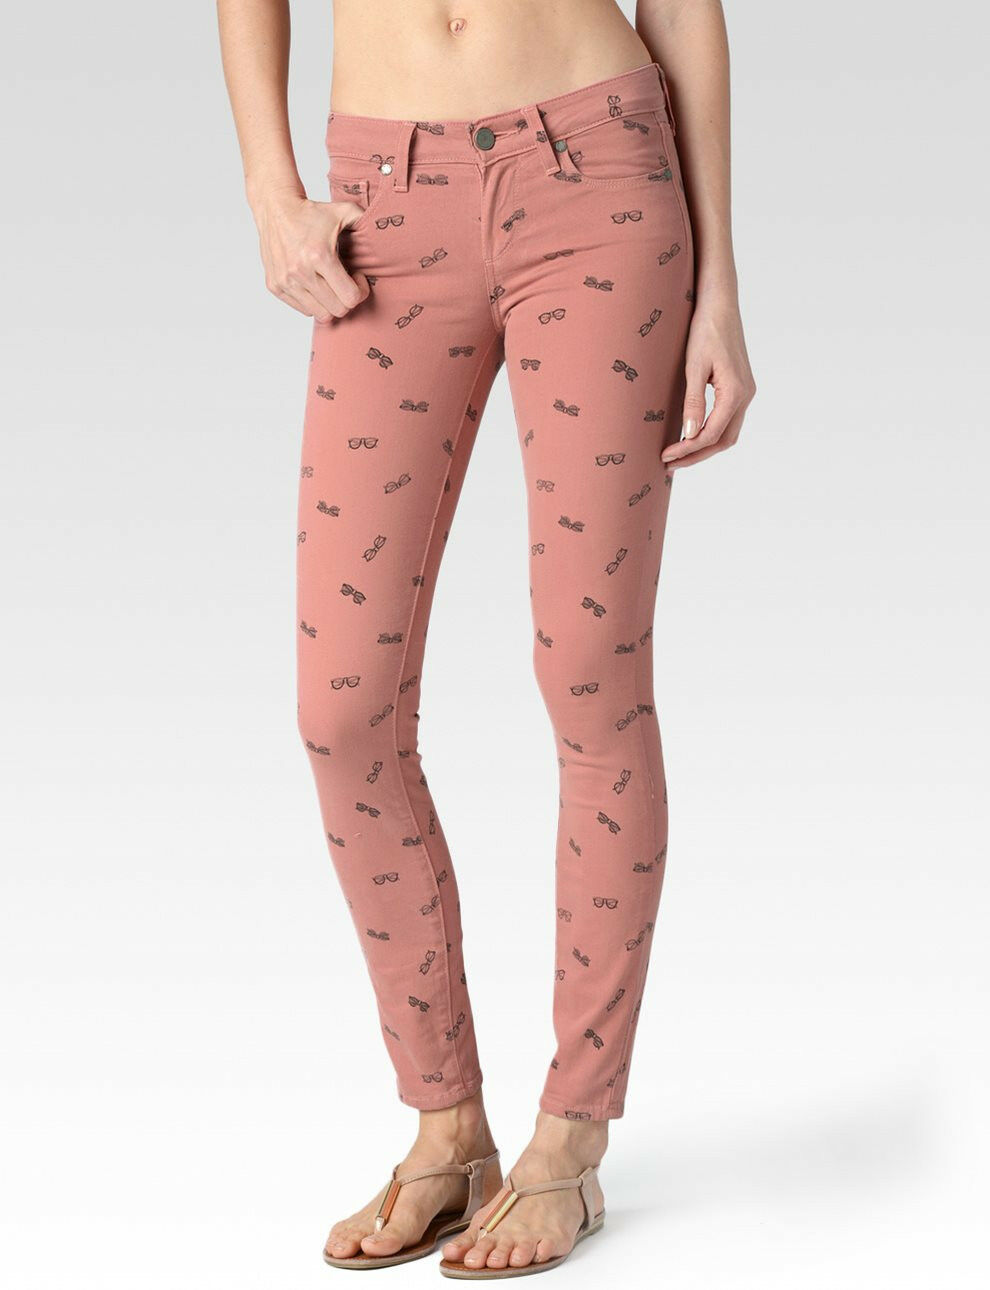 Paige Rosa Sunnies Sunglass Print Verdugo Ankle Jeans Sz 25 New